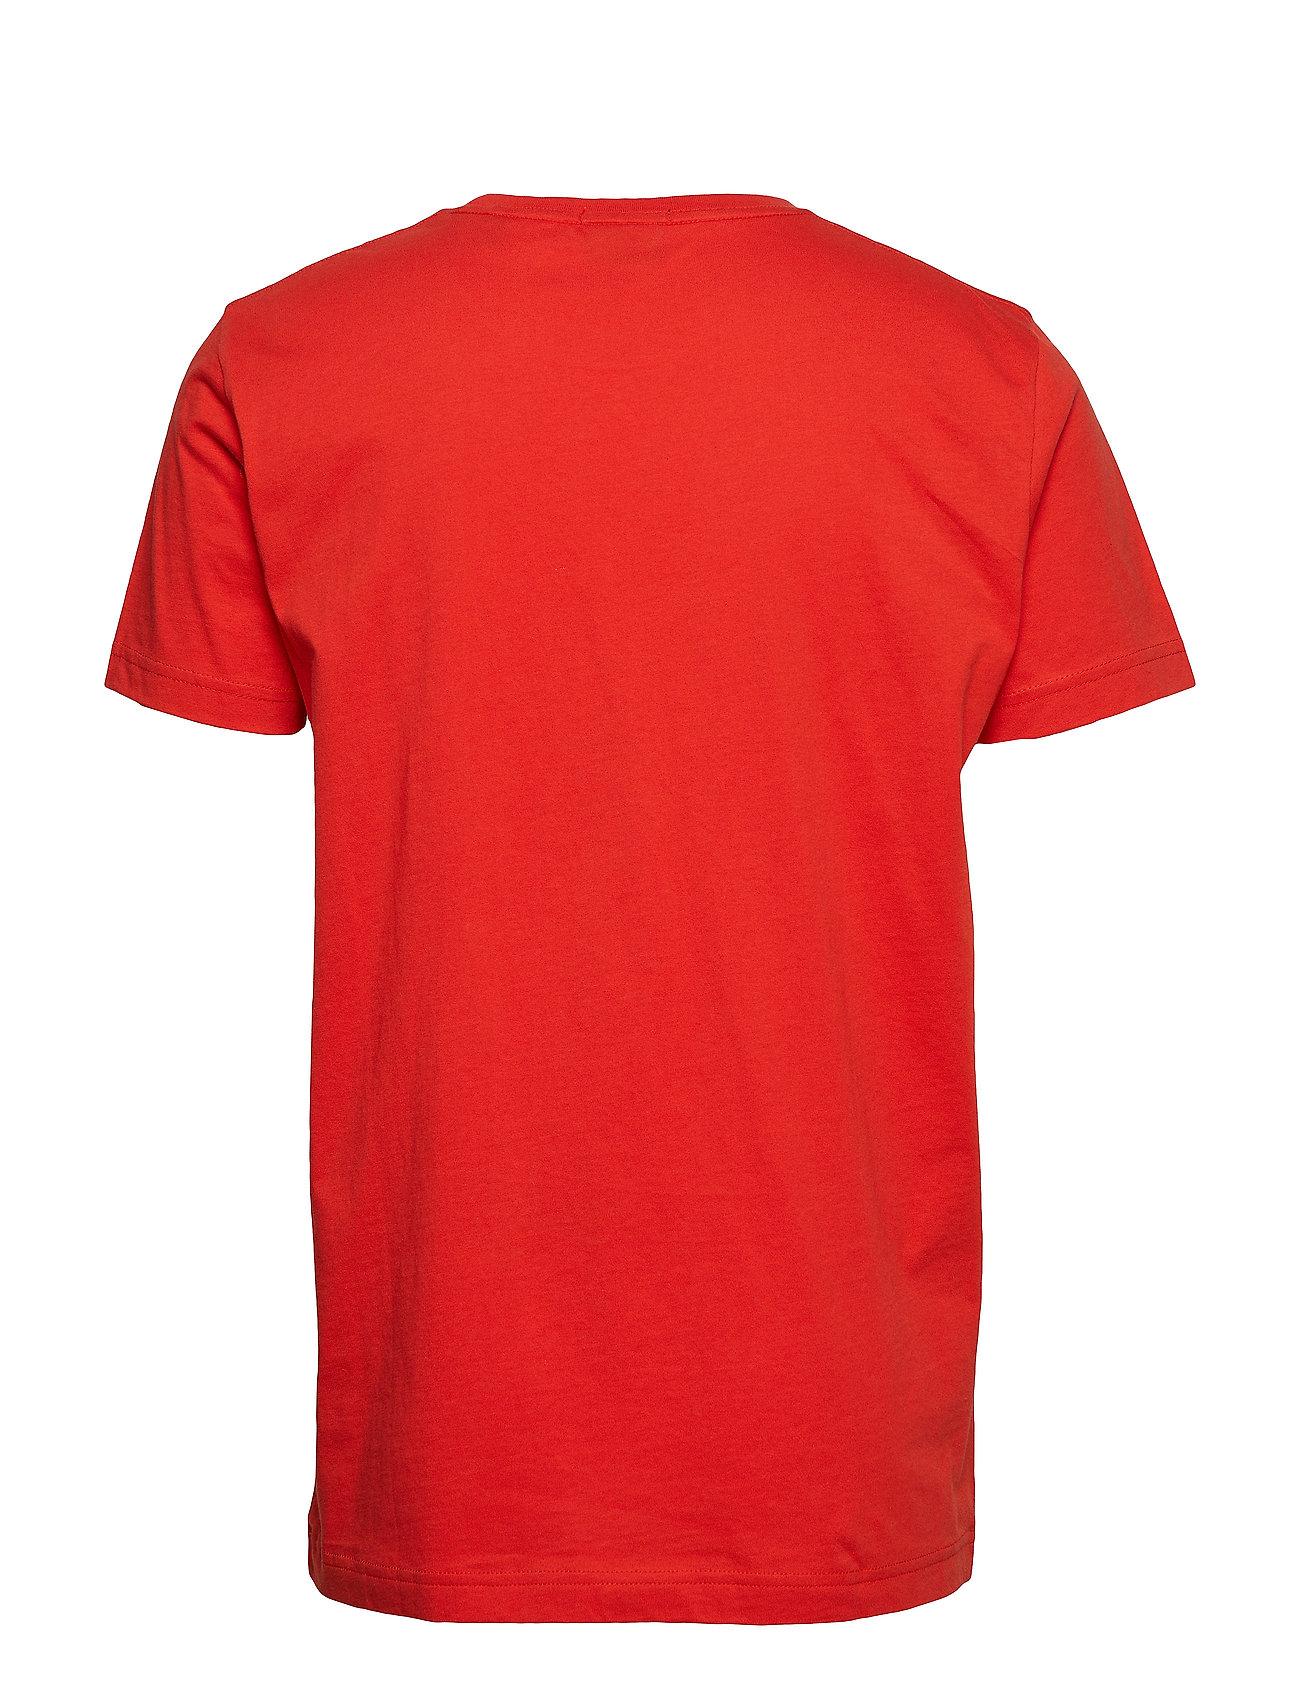 OrangeGant The T shirtblood Original Ss SMqzpVU